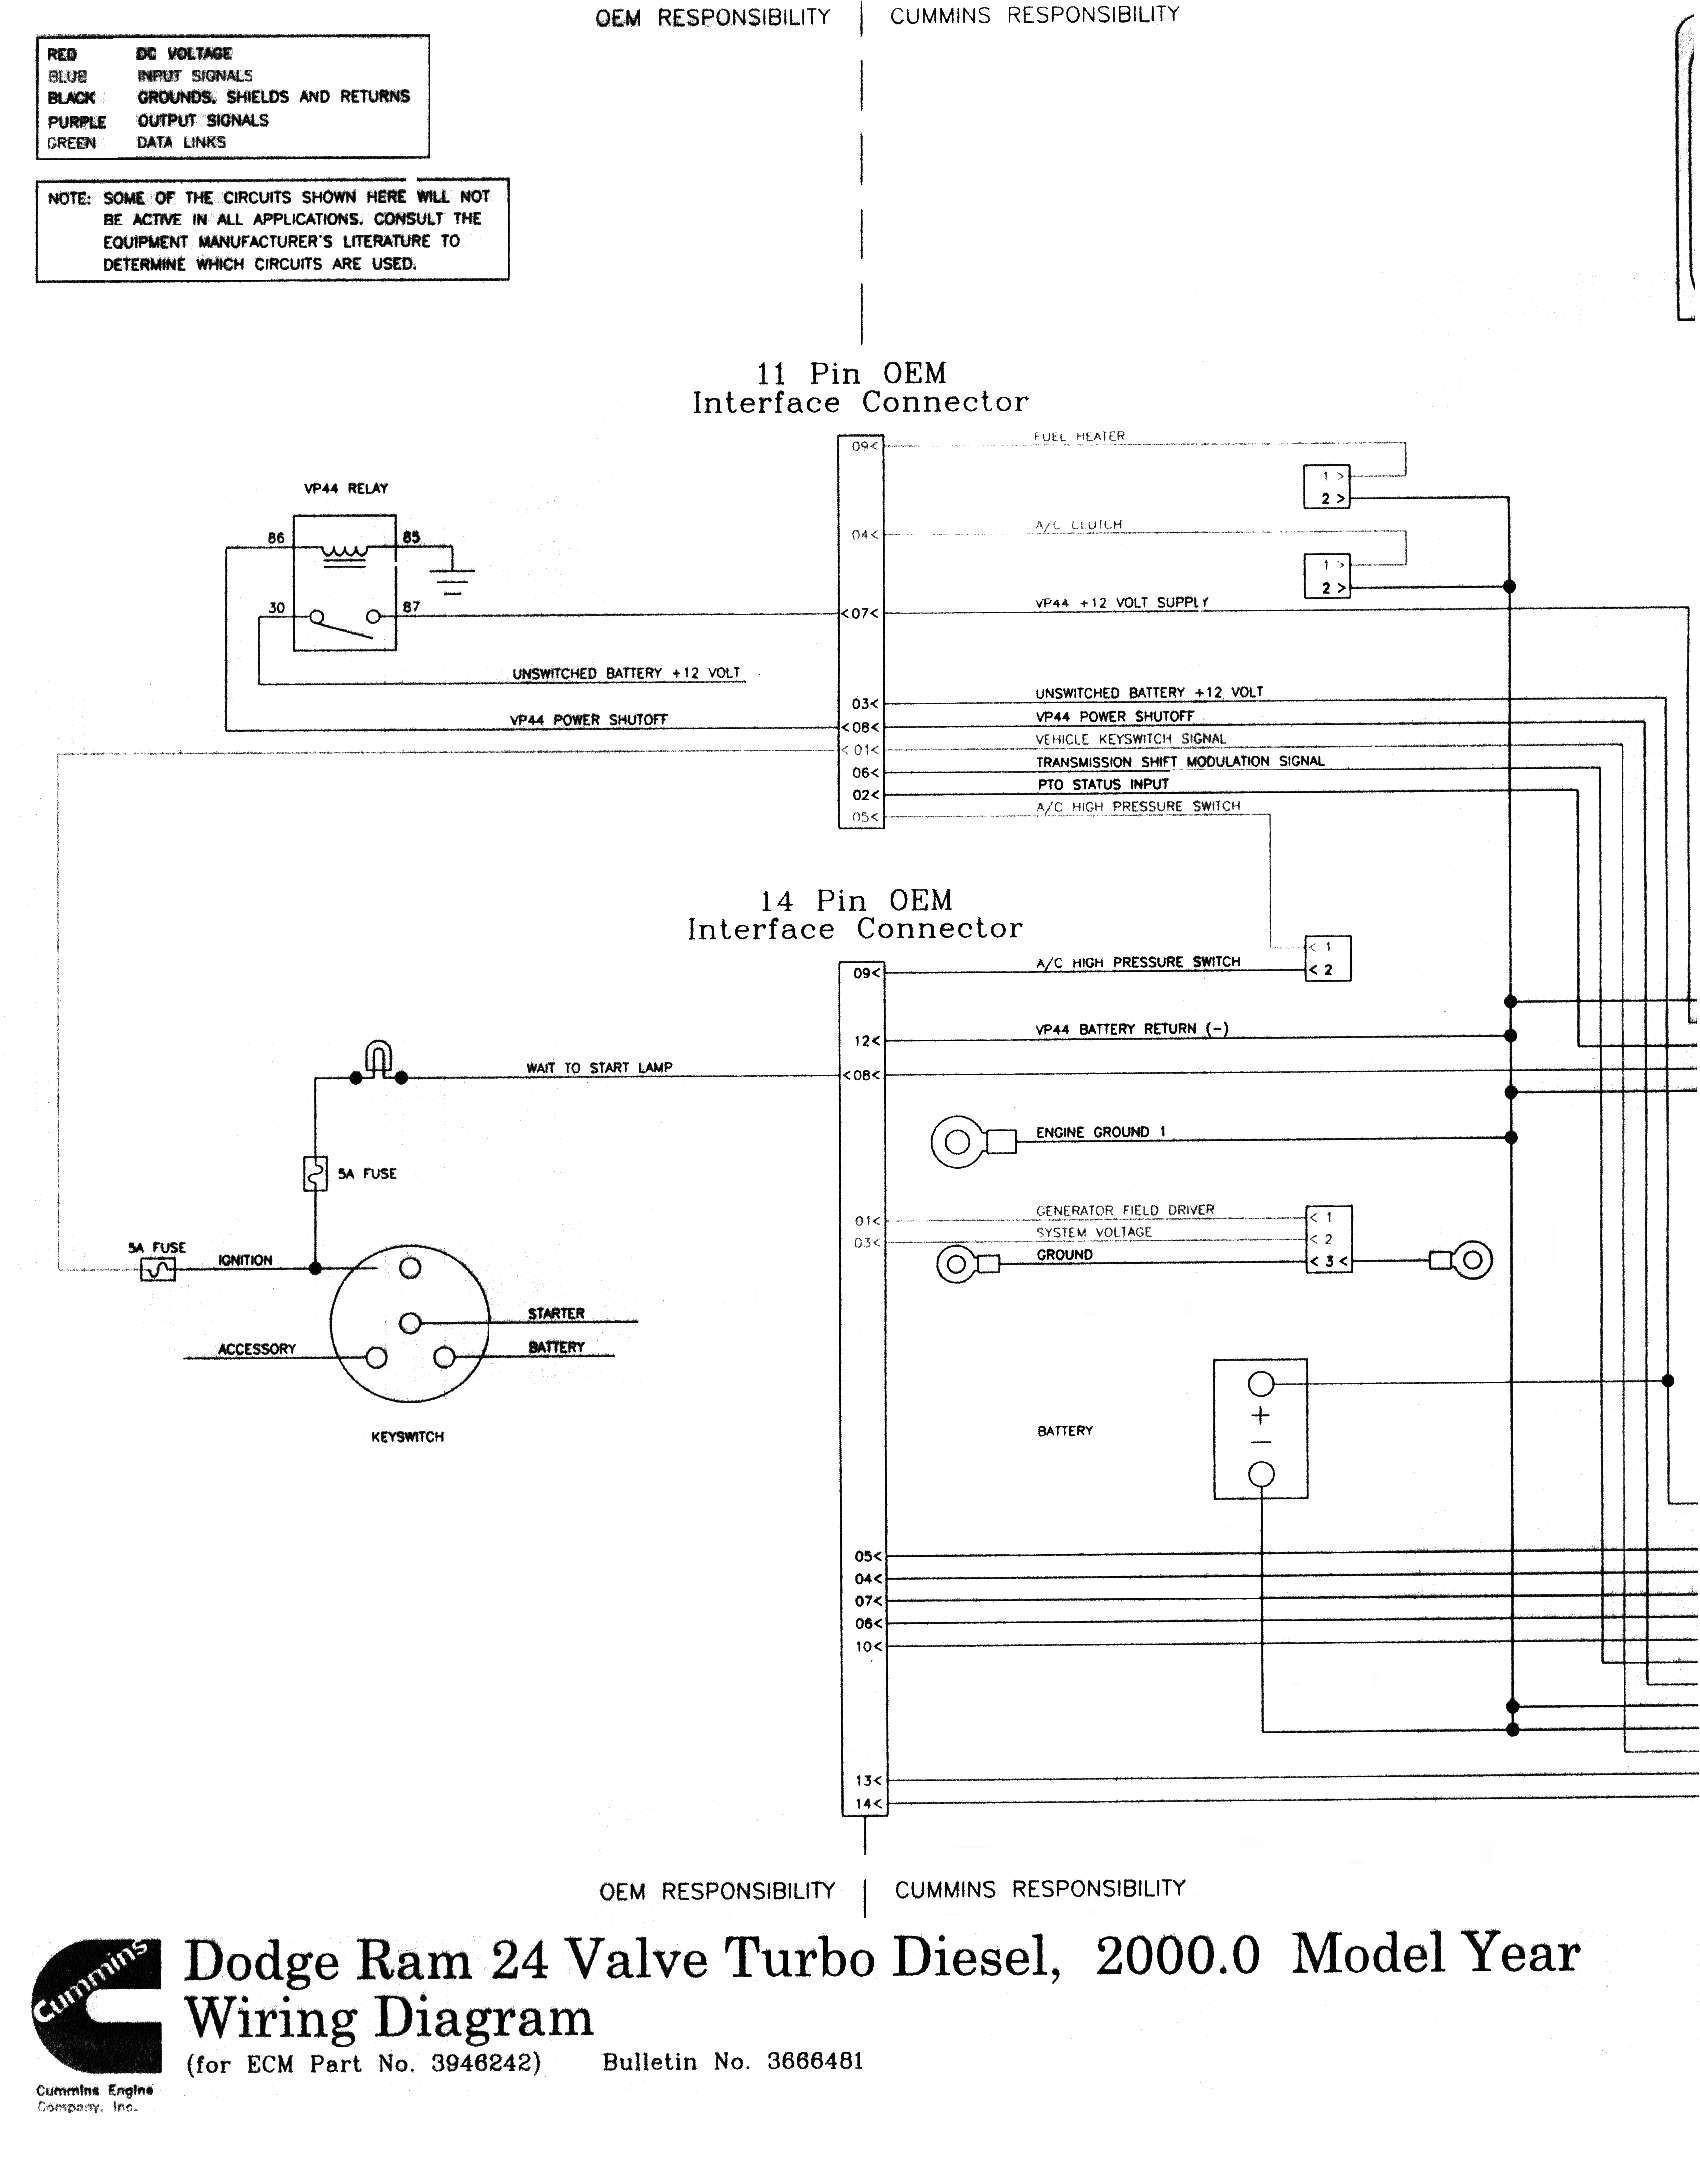 hight resolution of 1998 dodge ram wiring diagram dodge ram oem parts diagram of 1998 dodge ram wiring diagram